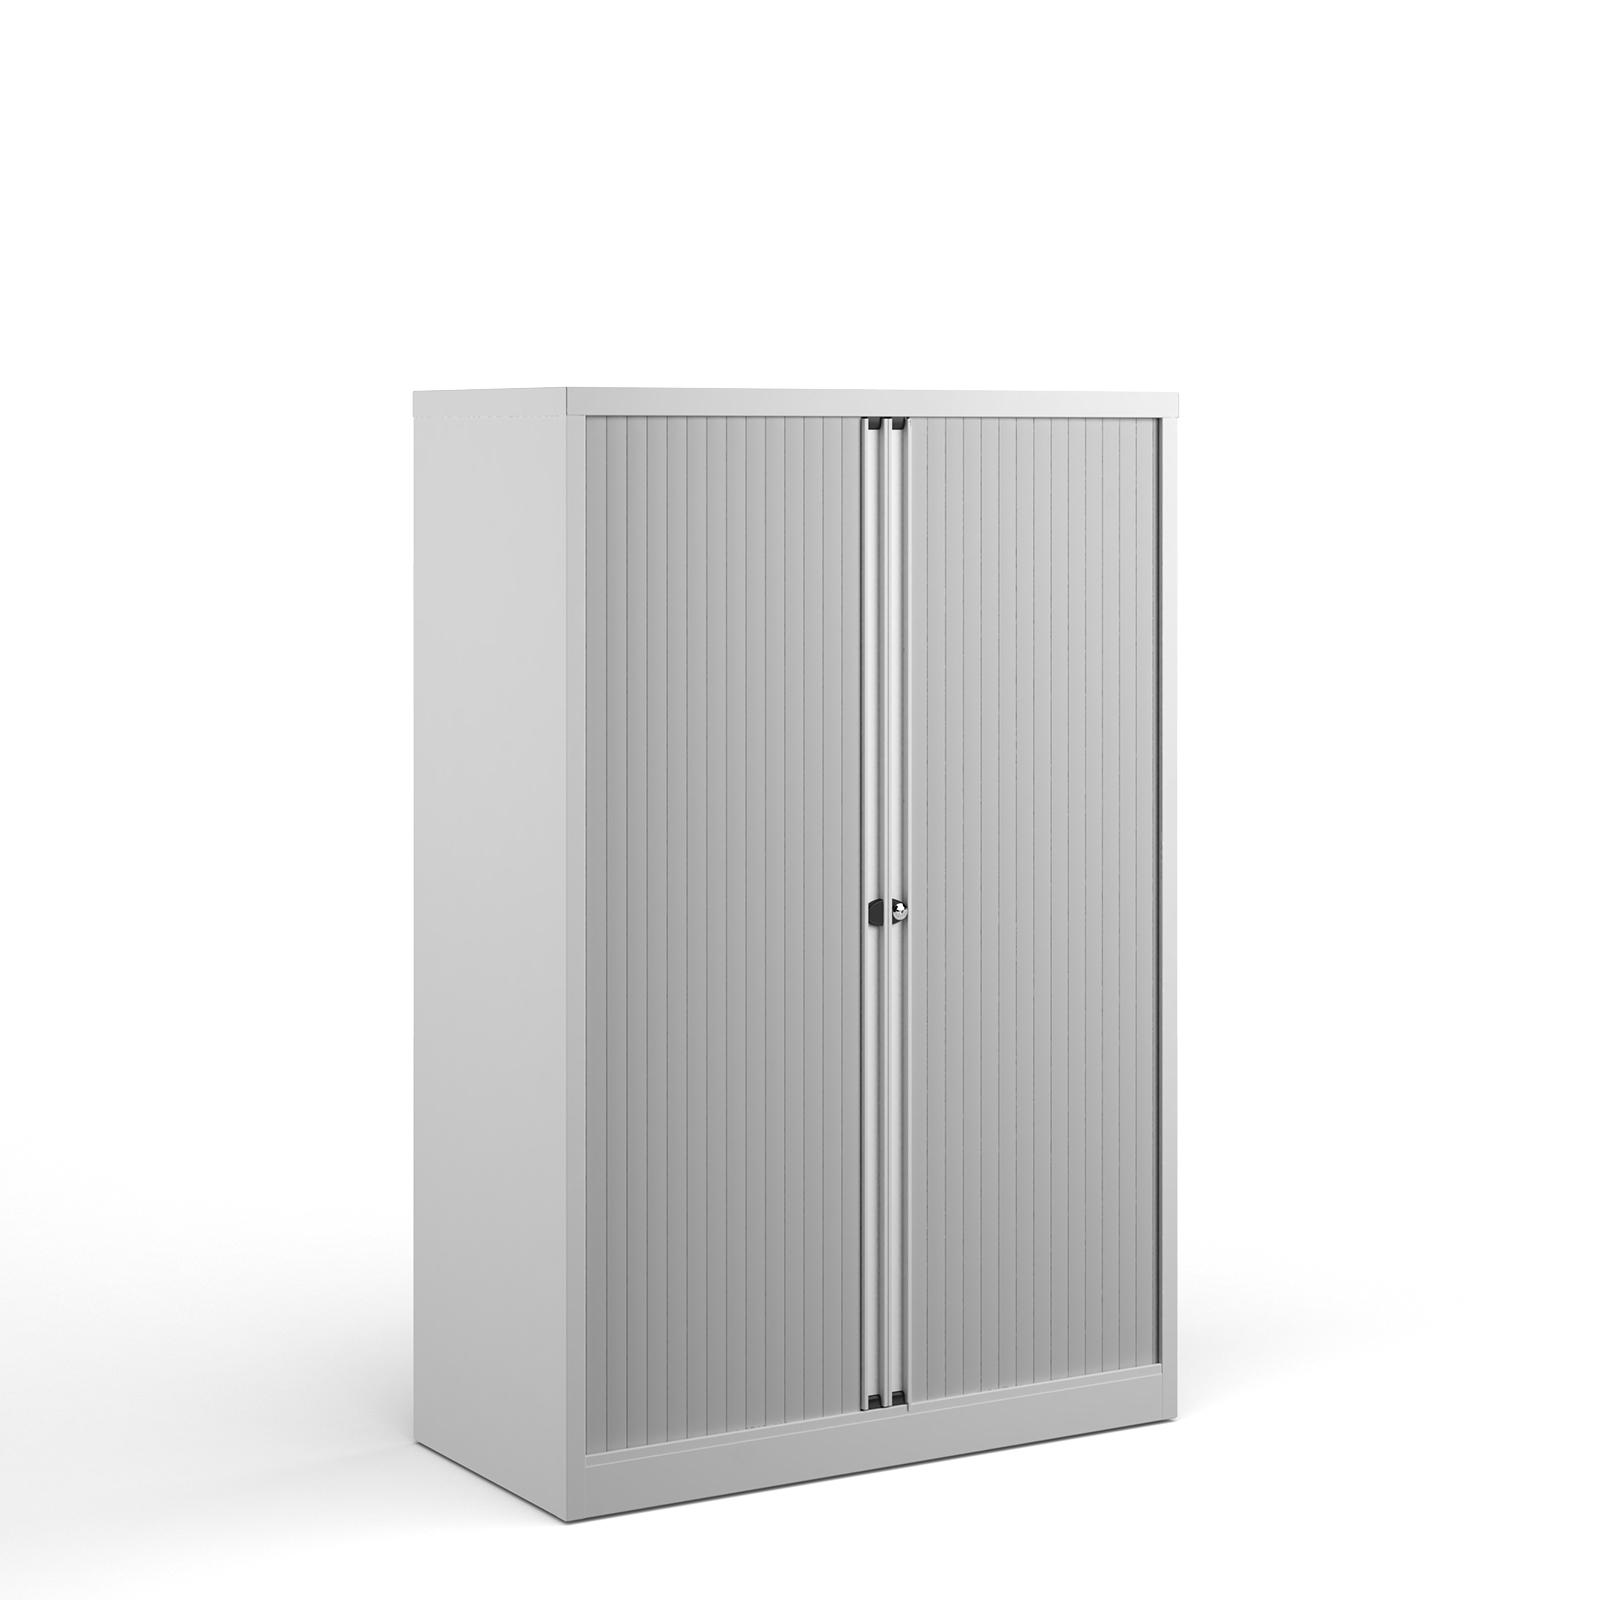 Over 1200mm High Bisley systems storage medium tambour cupboard 1570mm high - white